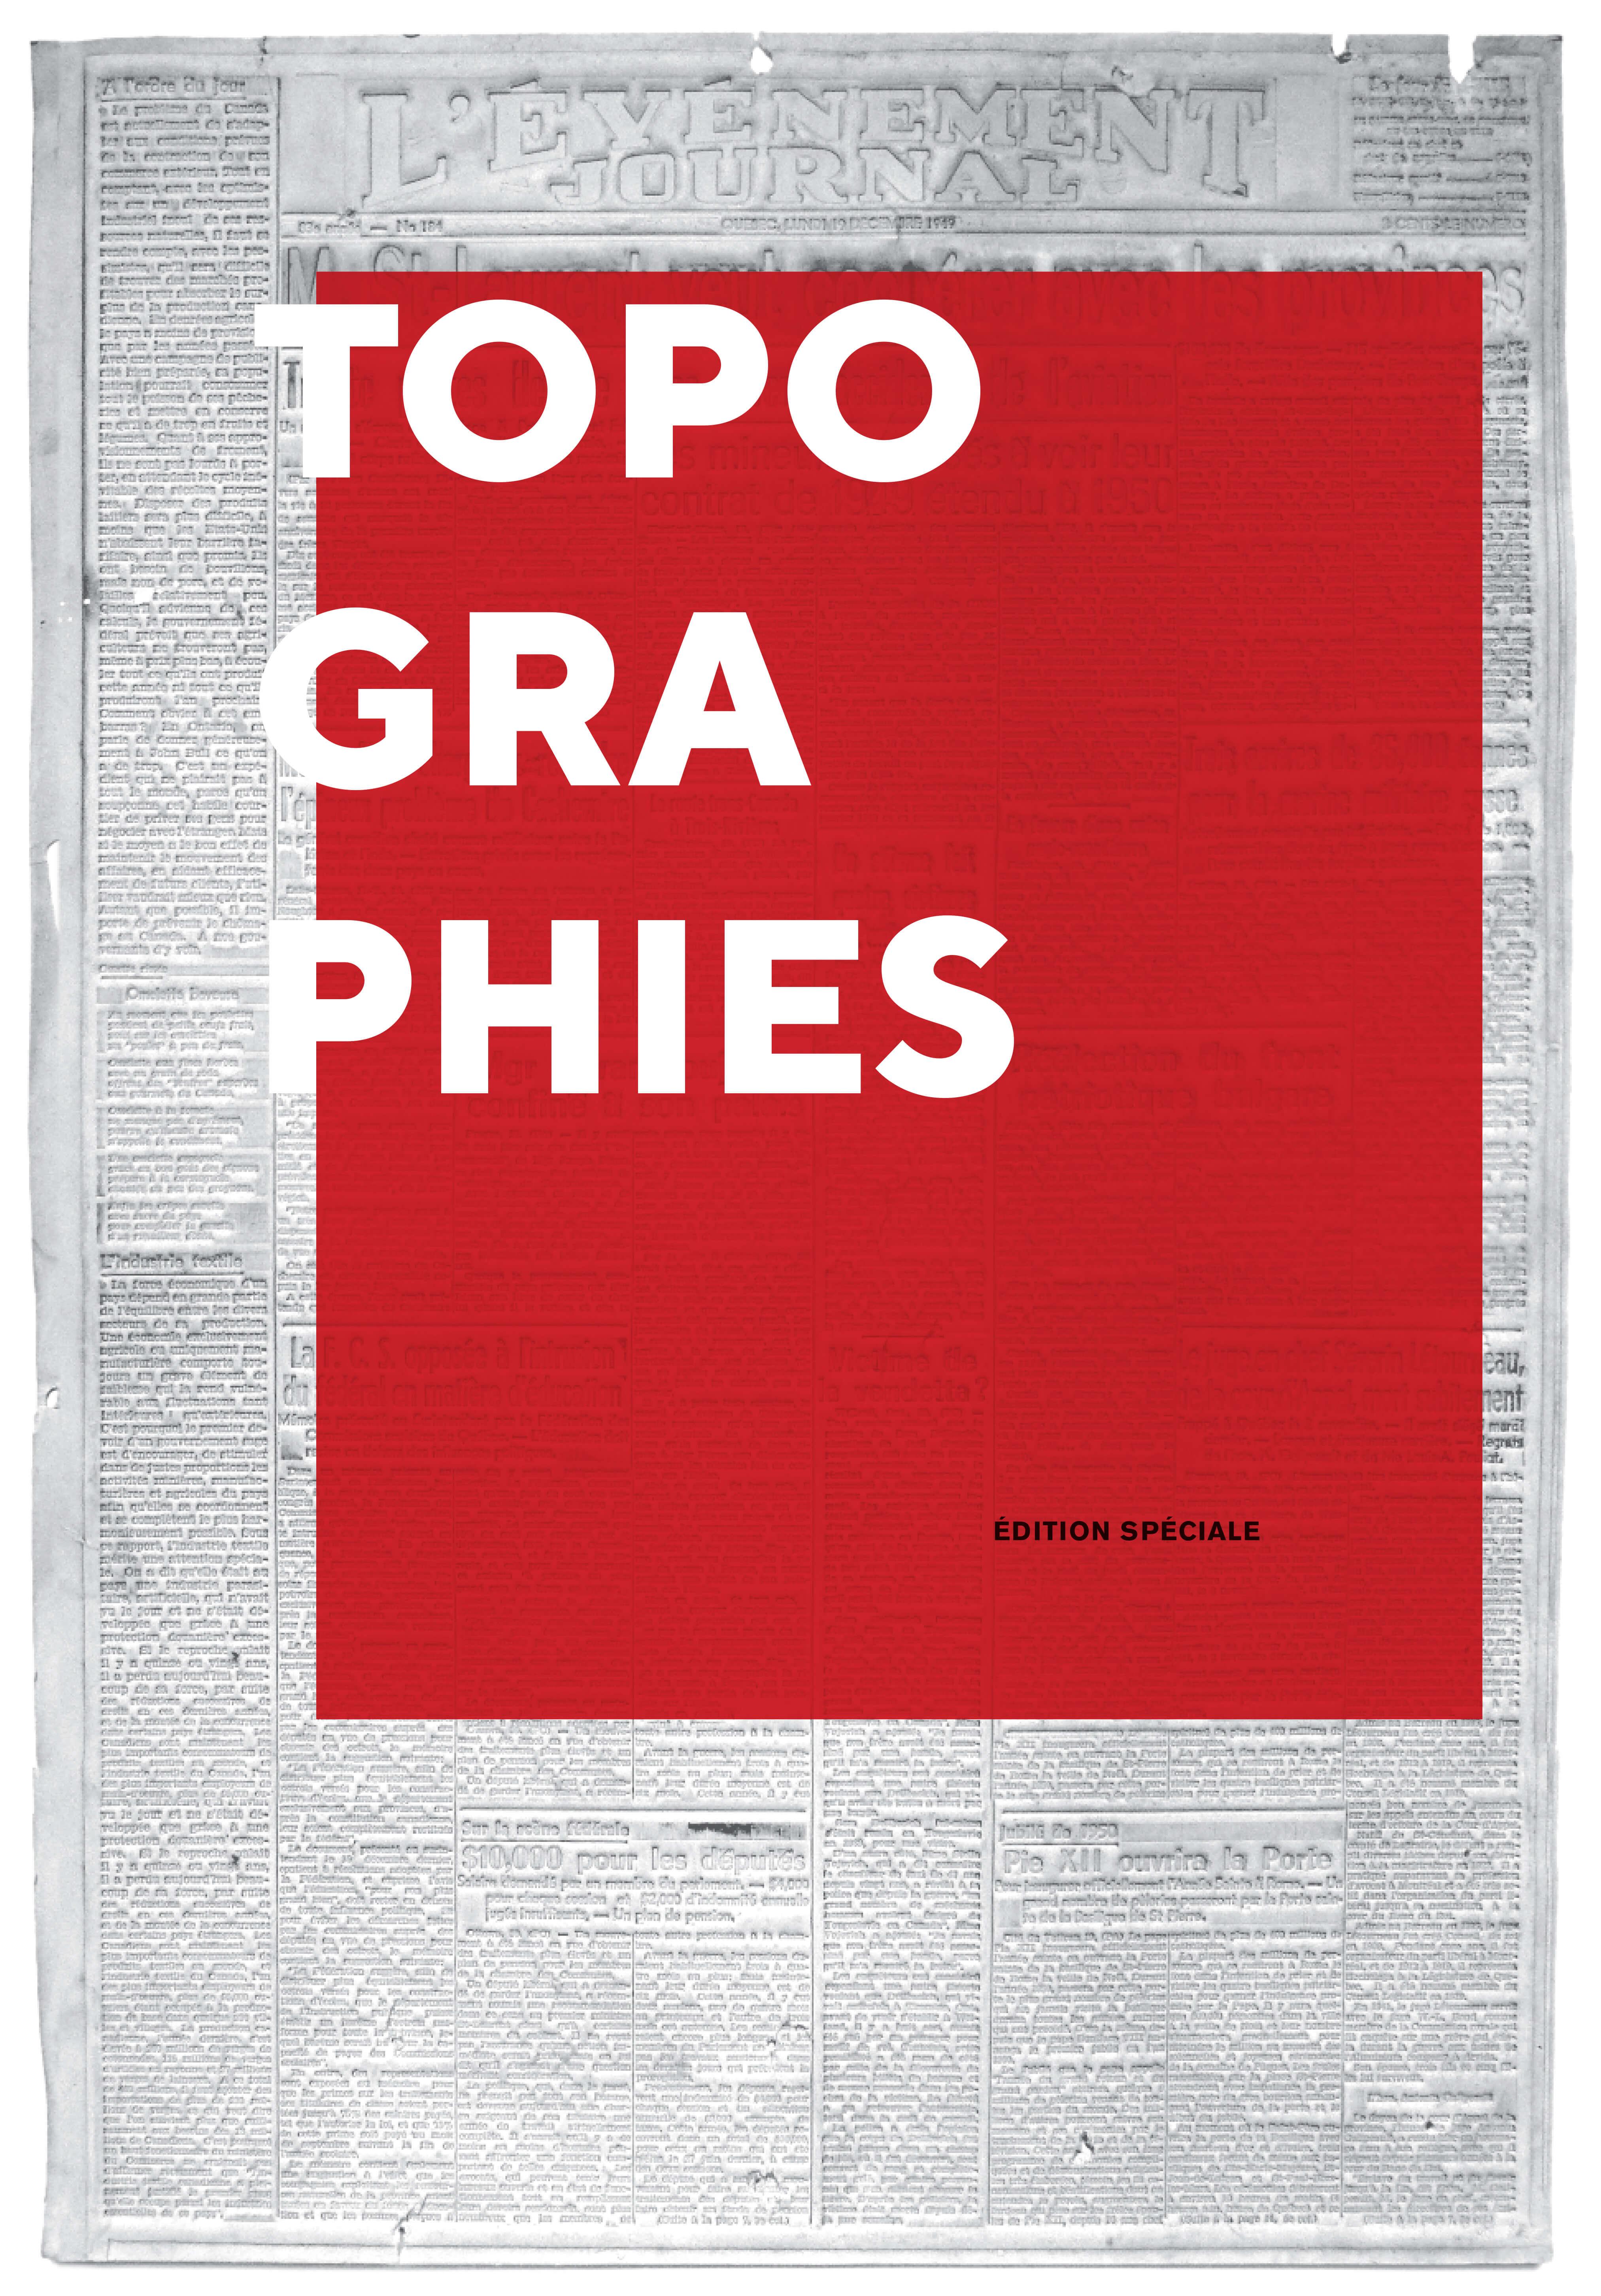 Topographies - Journal couverture copie